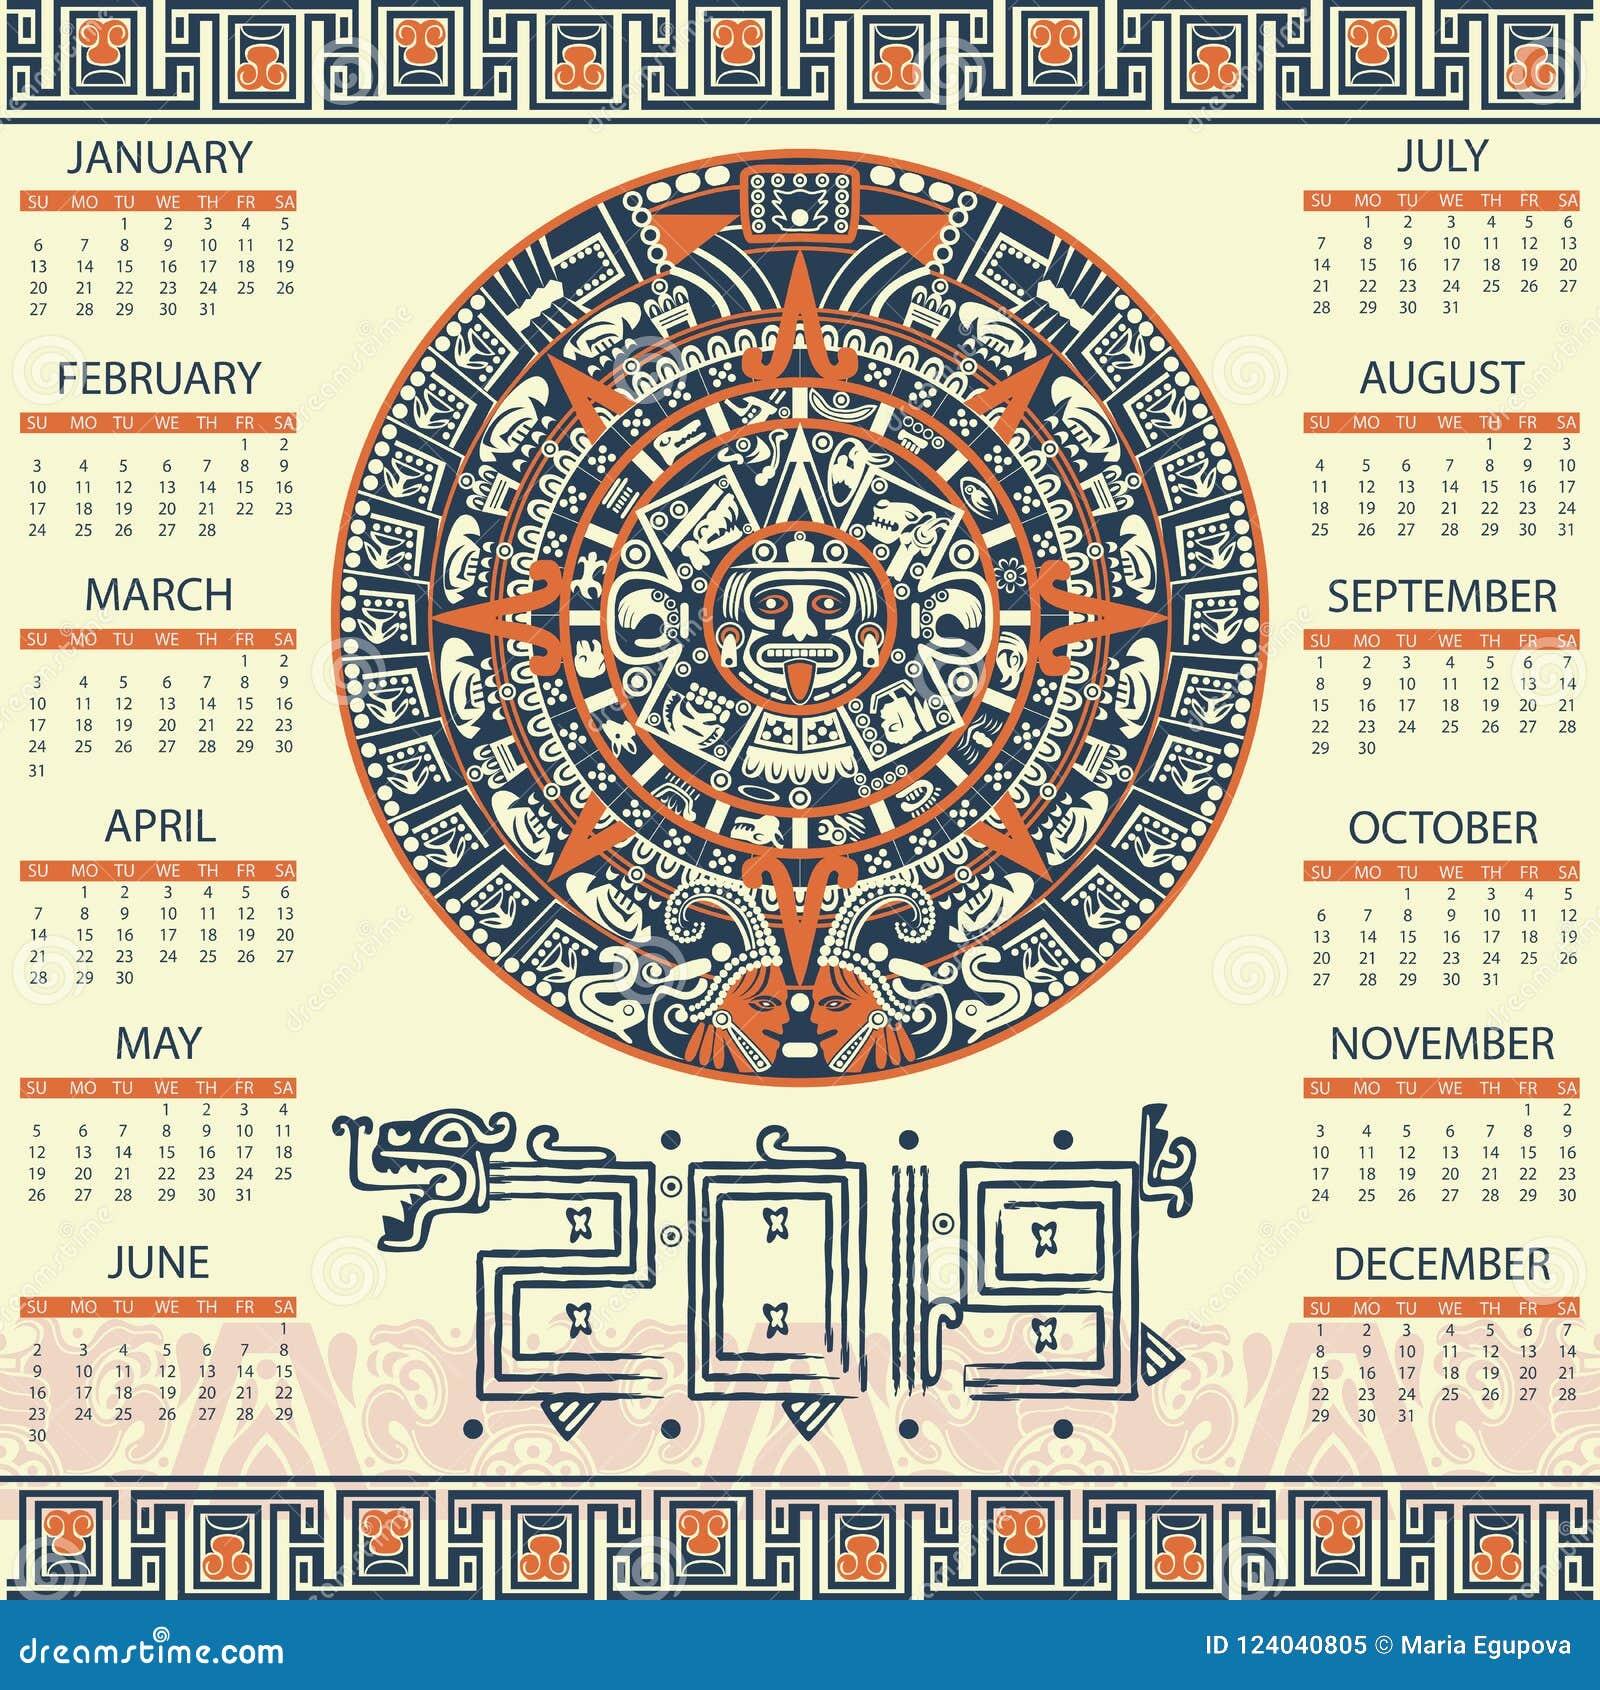 Mayan Calendar 2019 Aztec calendar 2019 stock vector. Illustration of culture   124040805